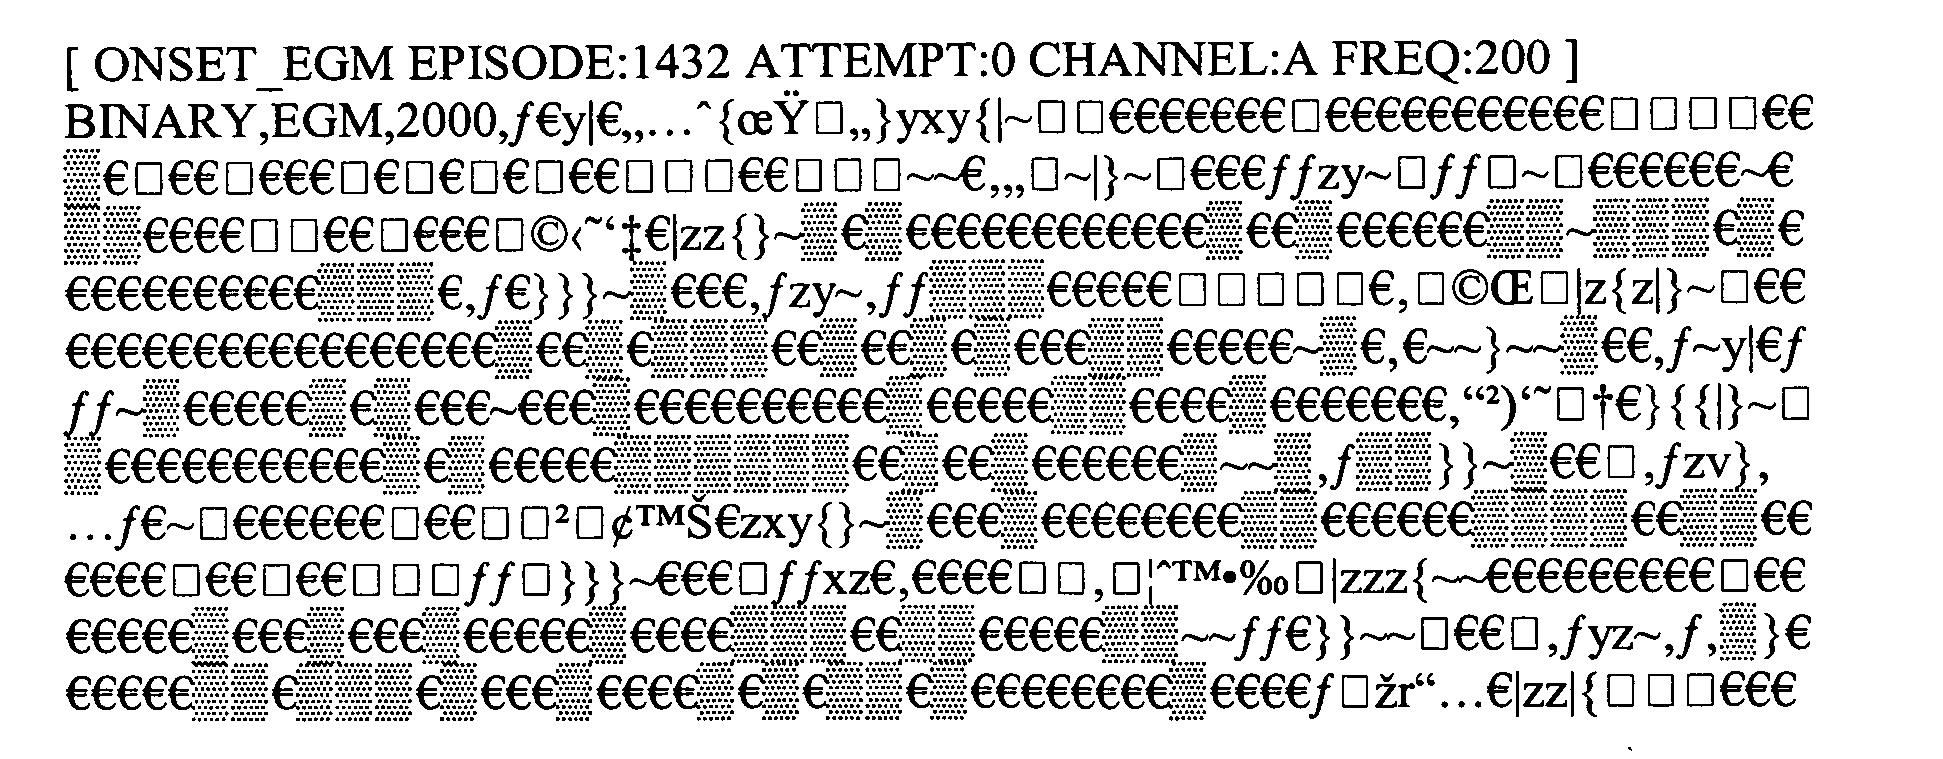 Figure US20050192838A1-20050901-P00001